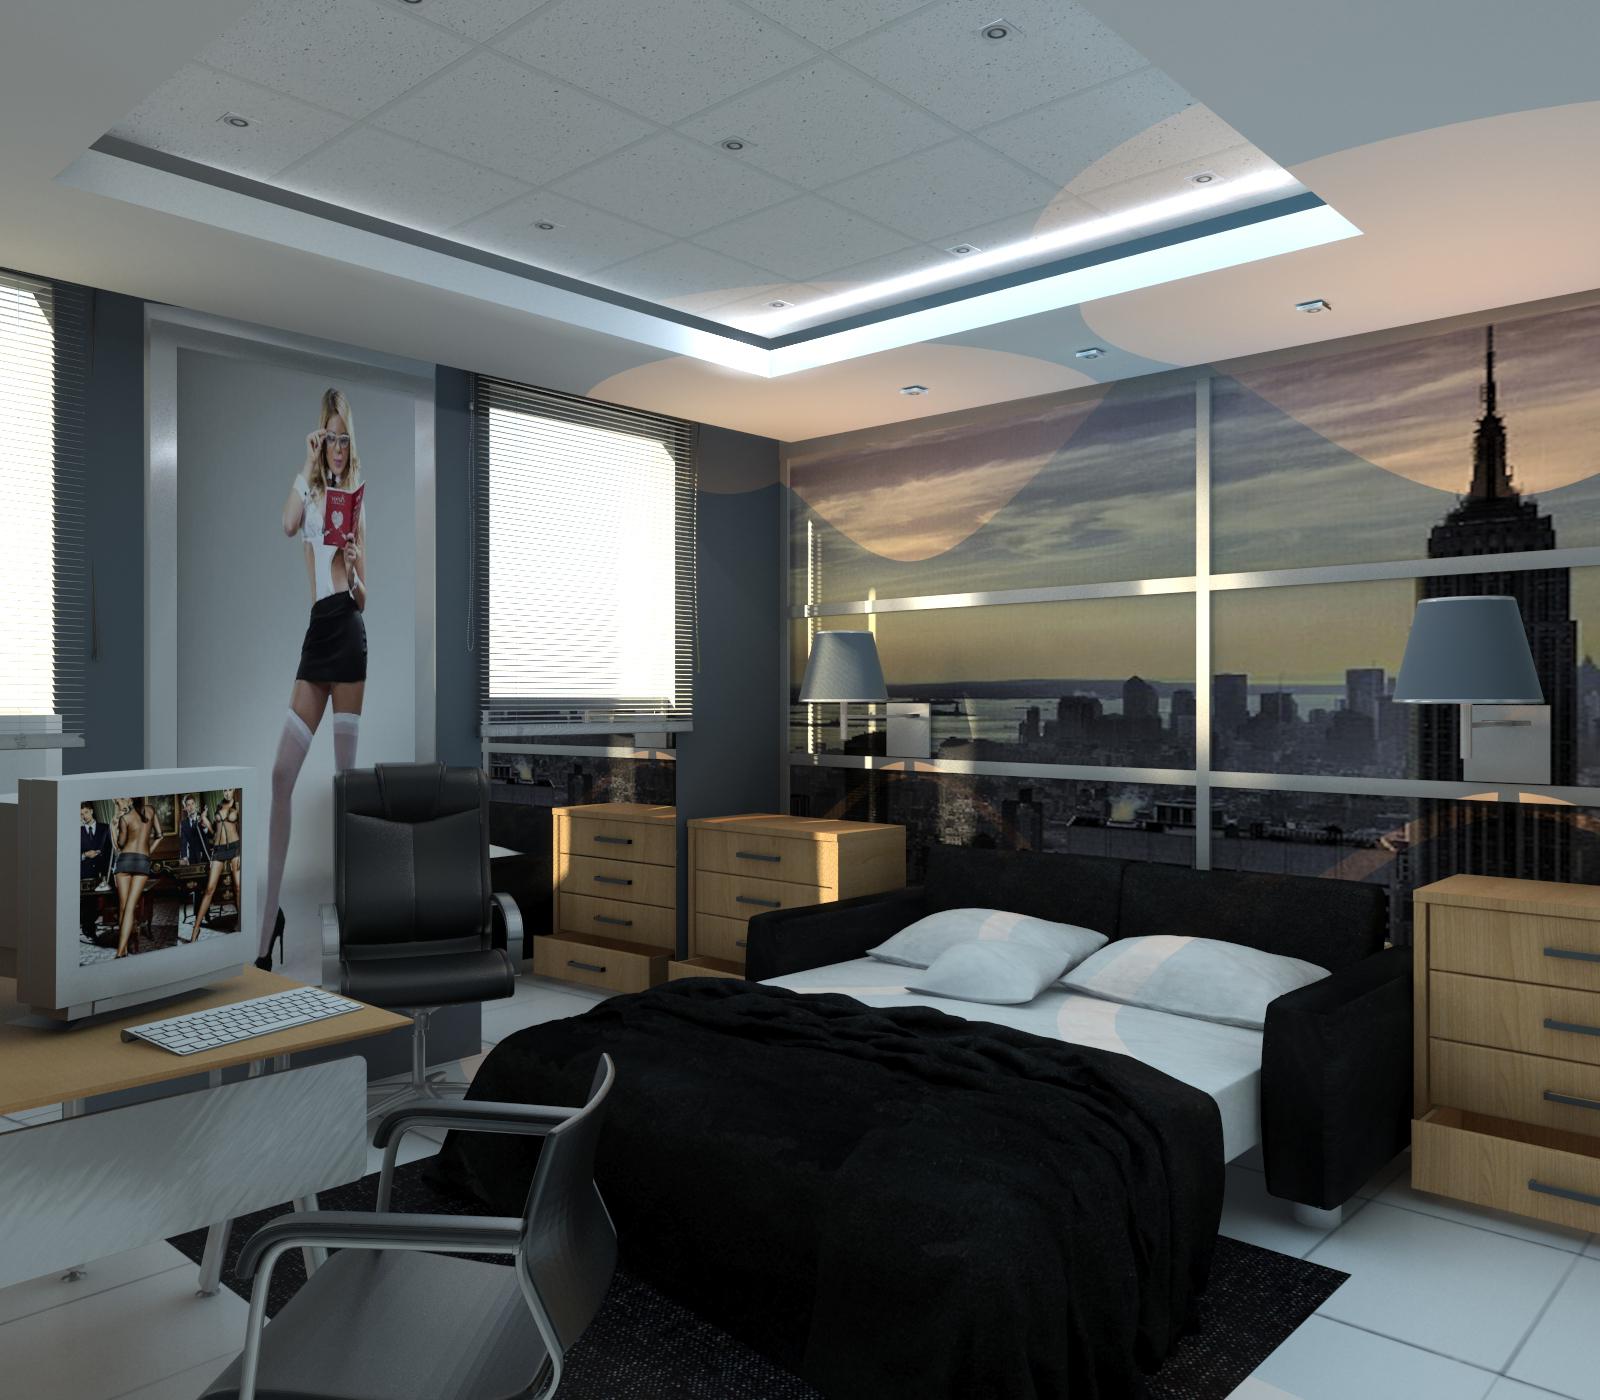 Dise o de interiores de hoteles grupo mobilart for Tipos de disenos de interiores de casas